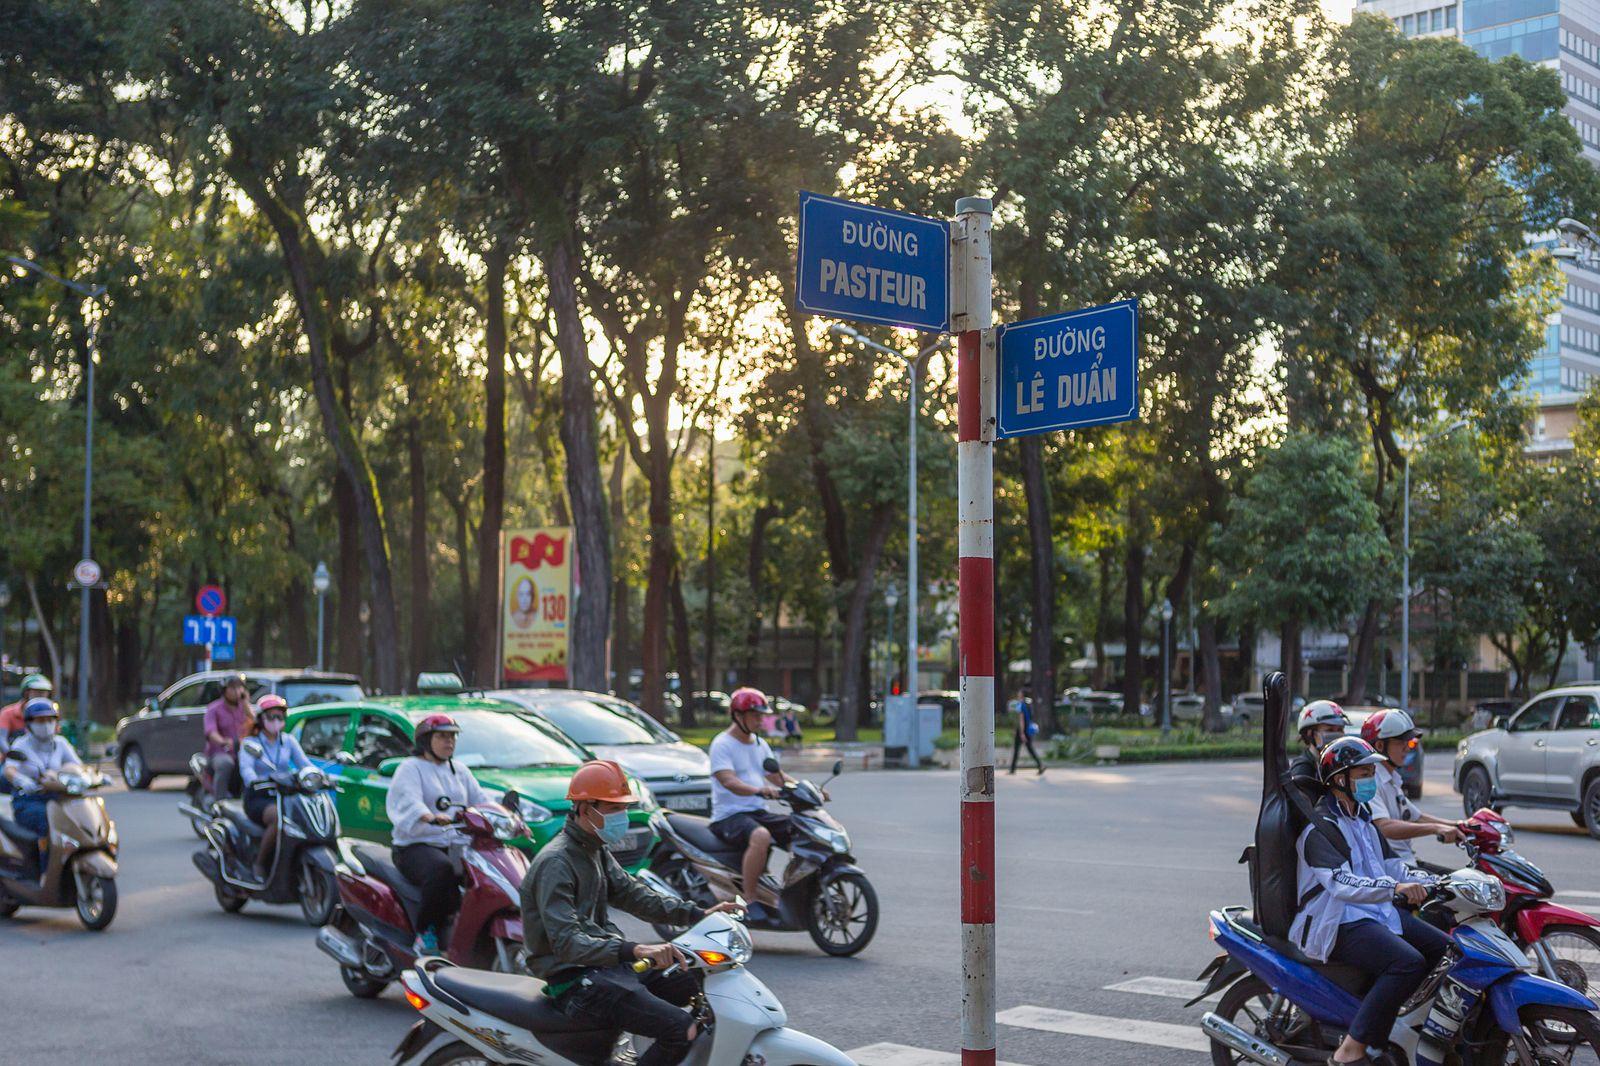 Morning Stories Roundup: HCMC Speeds up Work on 4 Underground